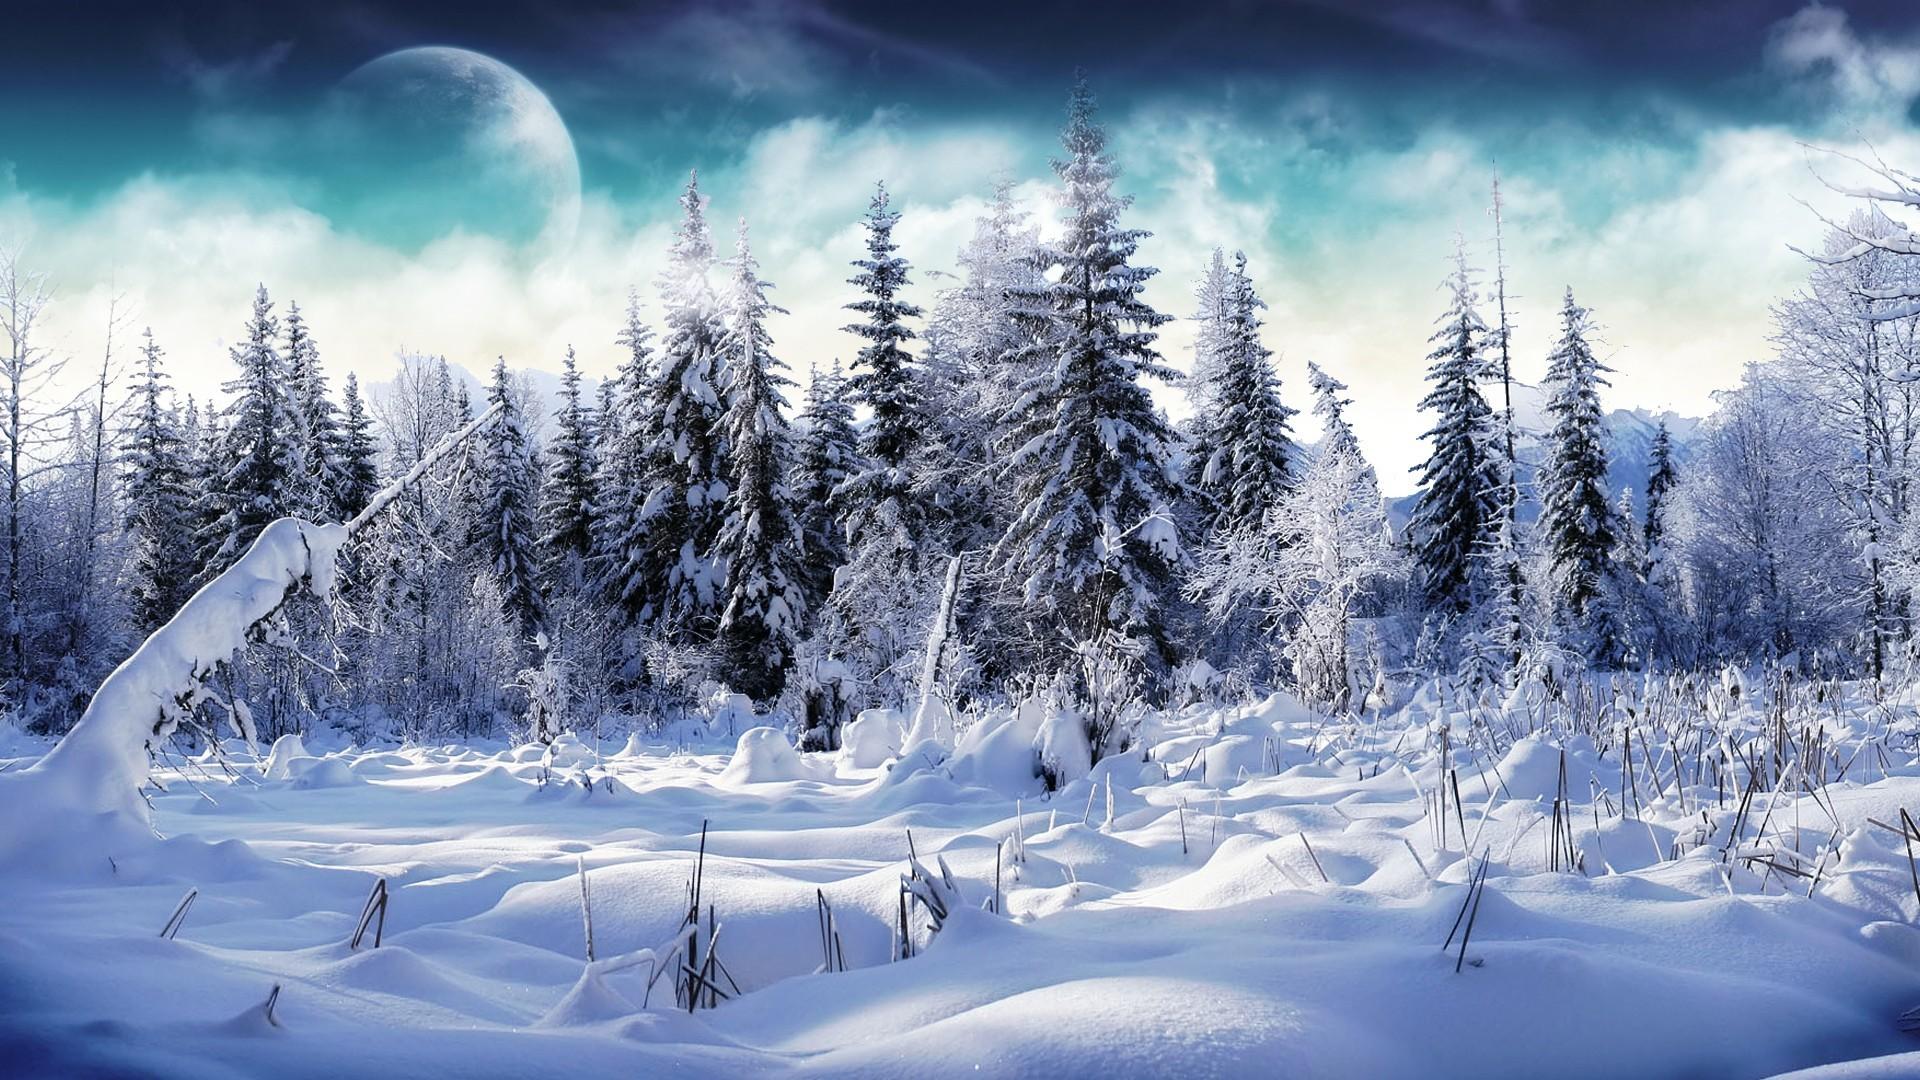 Winter Wallpapers For Desktop 57 Pictures